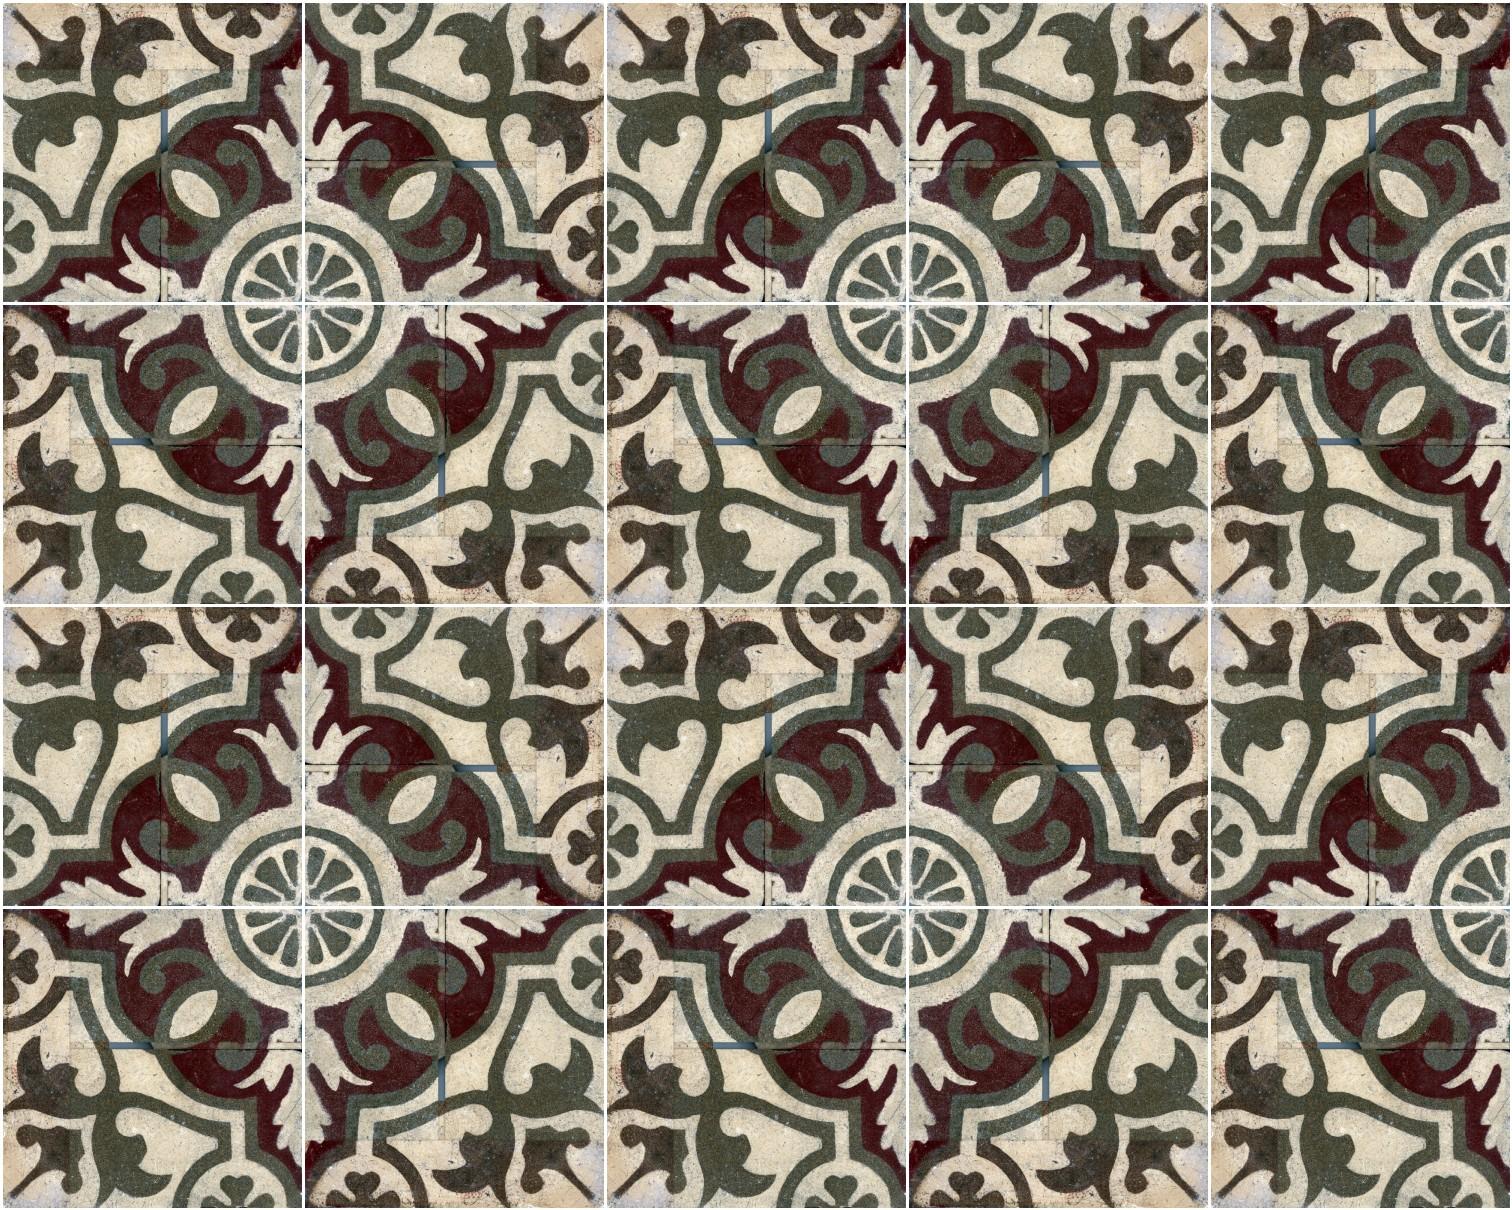 cement tiles zementfliesen mosaicos hidr ulicos. Black Bedroom Furniture Sets. Home Design Ideas